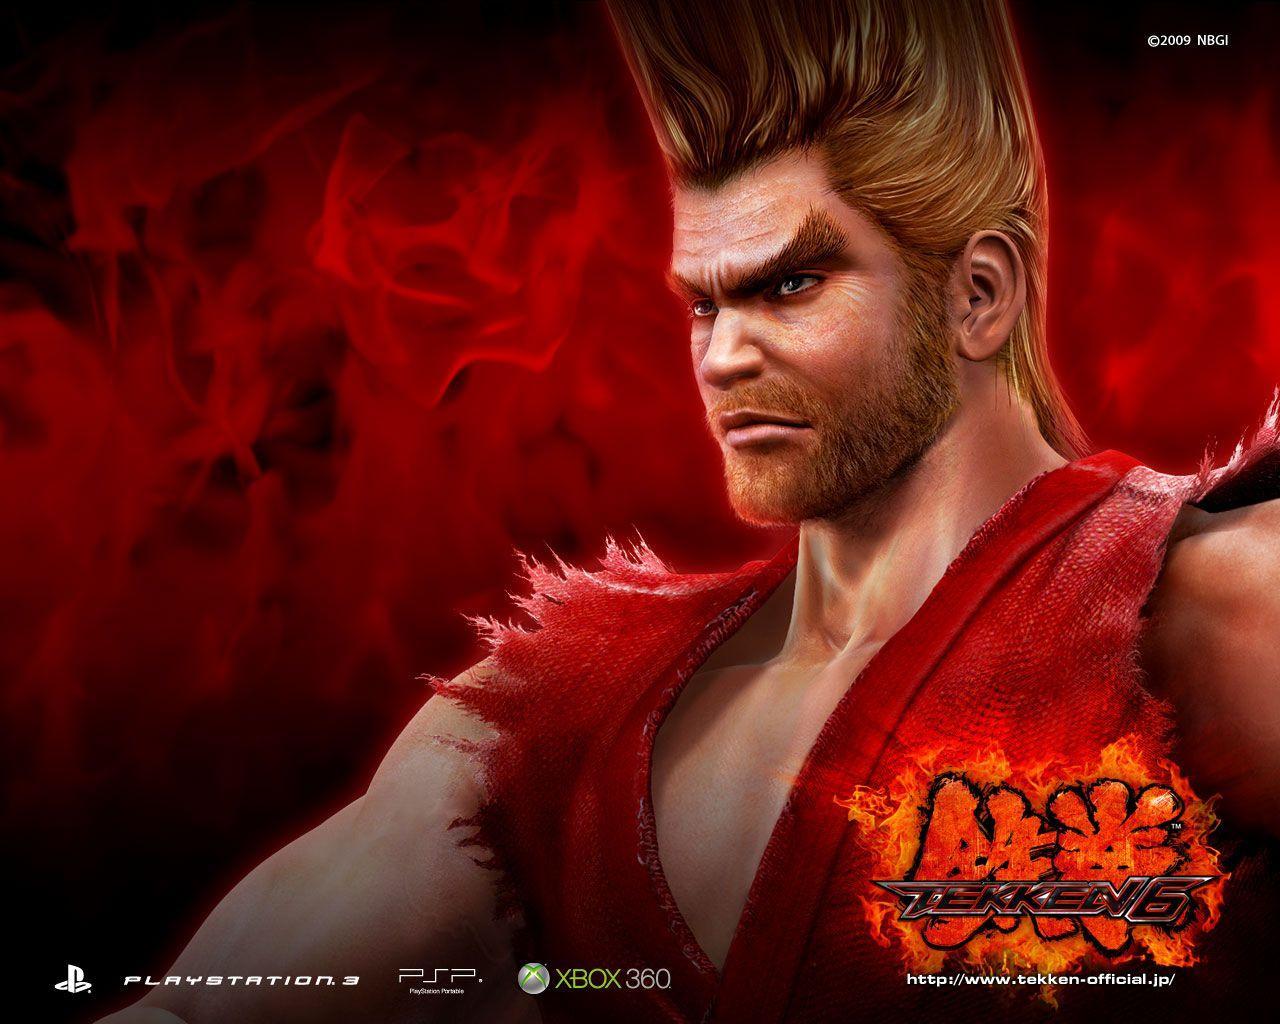 Tekken 3 Game Wallpaper New Game Wallpaper